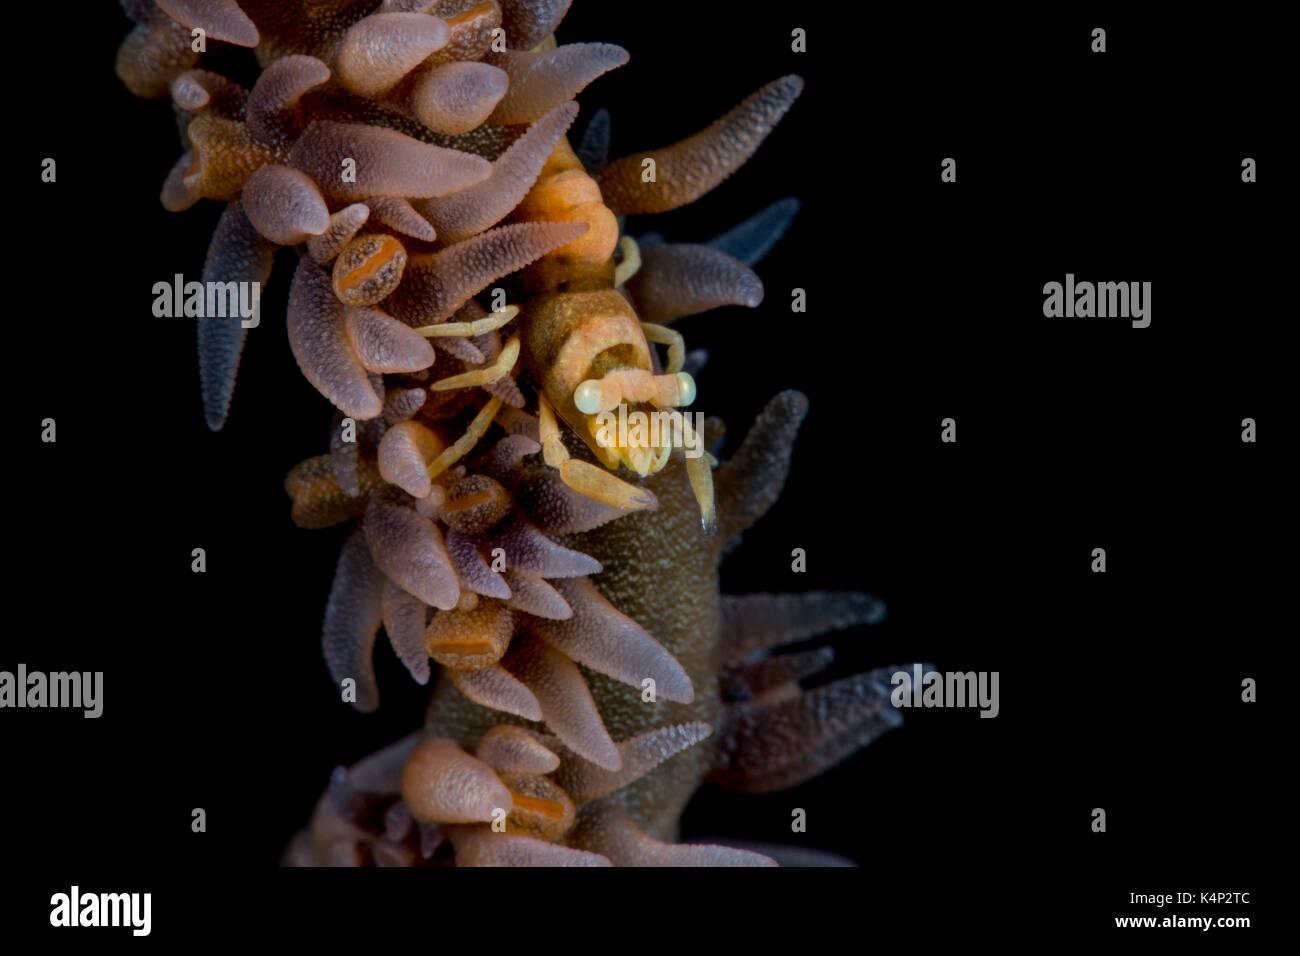 Zanzibar Whip Coral Shrimp on Black Background - Stock Image